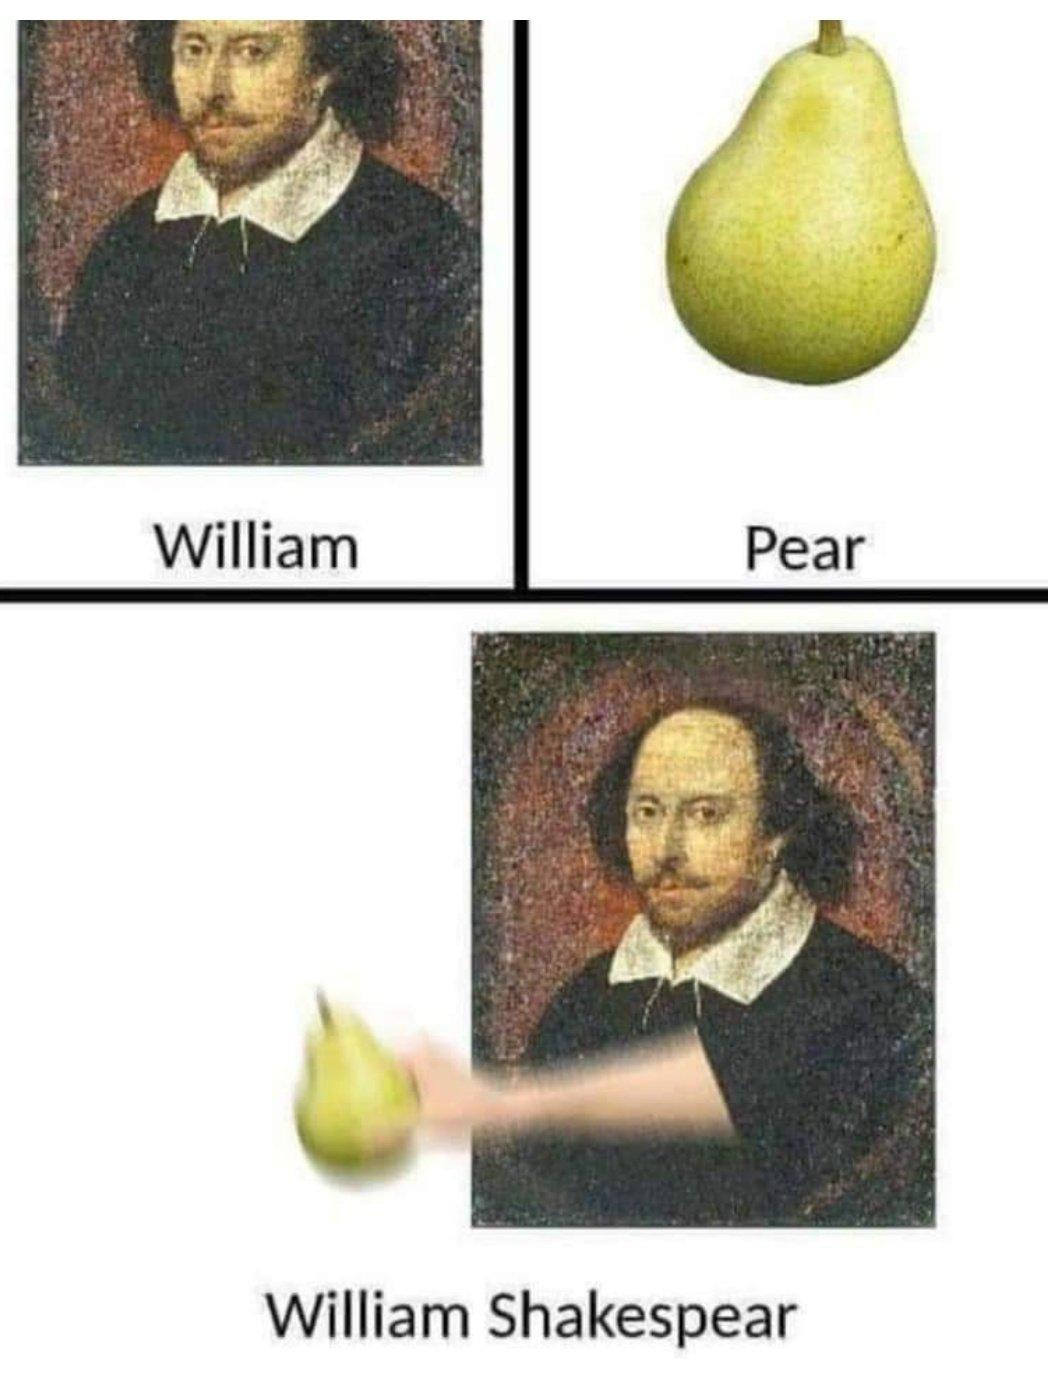 Memes William Shakespeare pear